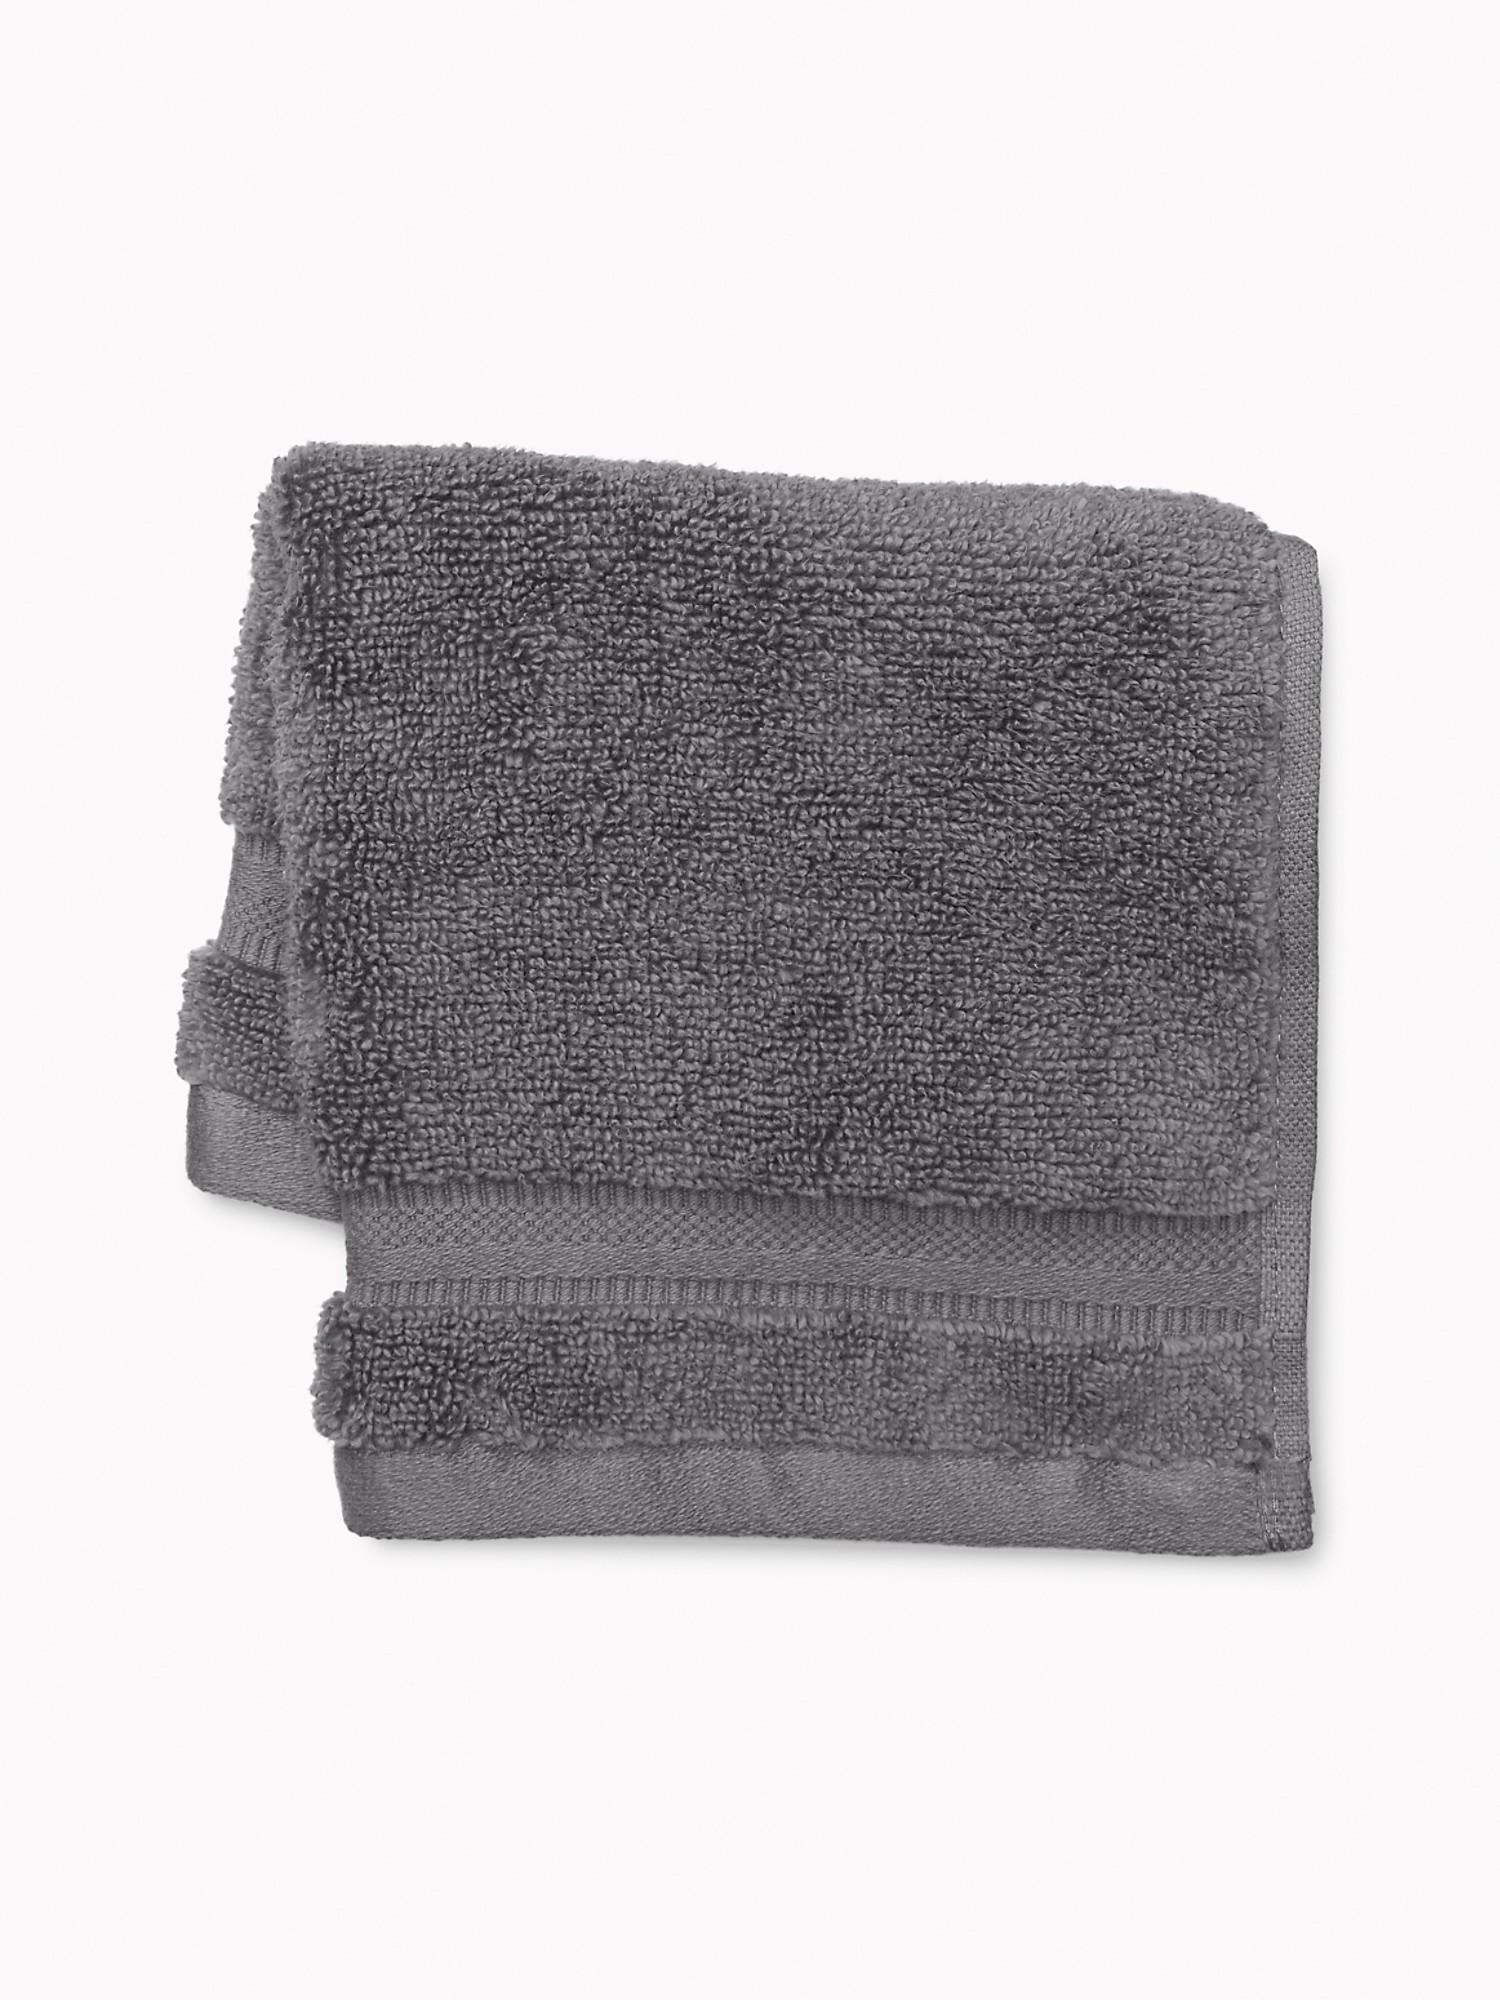 TOMMY HILFIGER Signature Solid Washcloth in Dark Gray